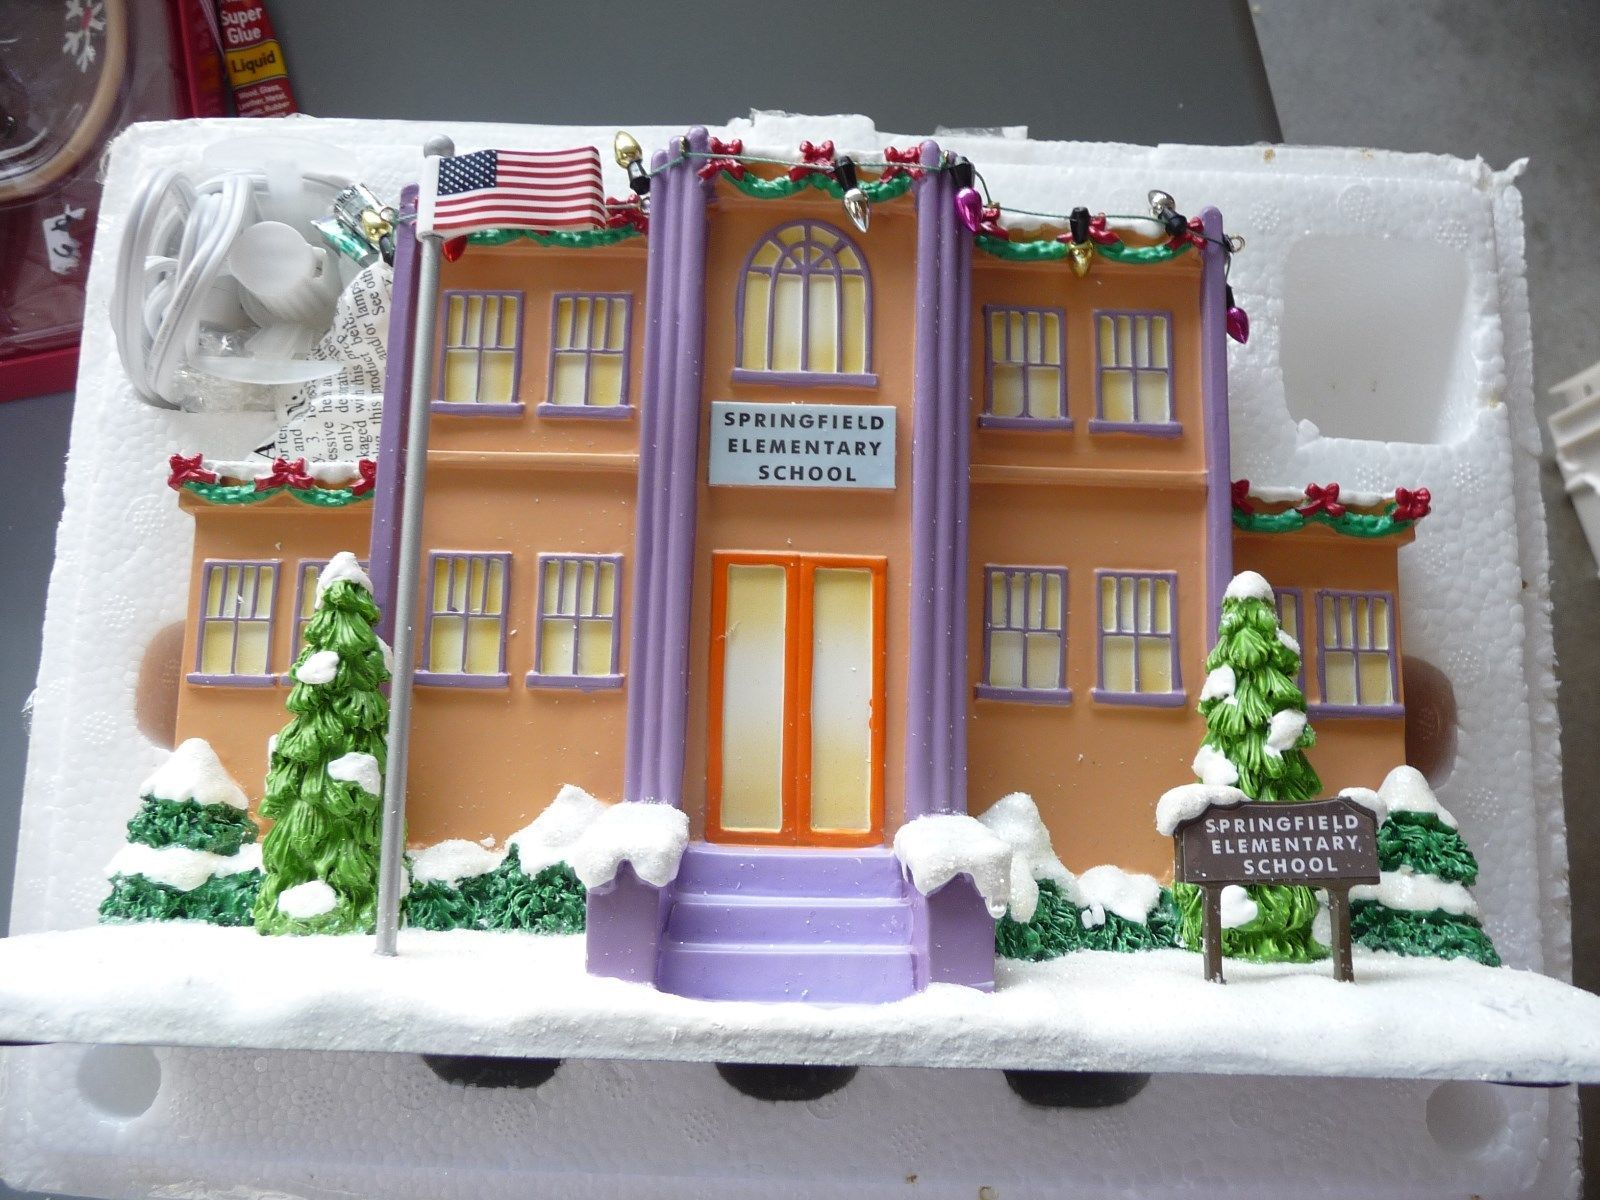 Simpsons Christmas Village.2008 09 Complete Simpson S Christmas Village By Hawthorne